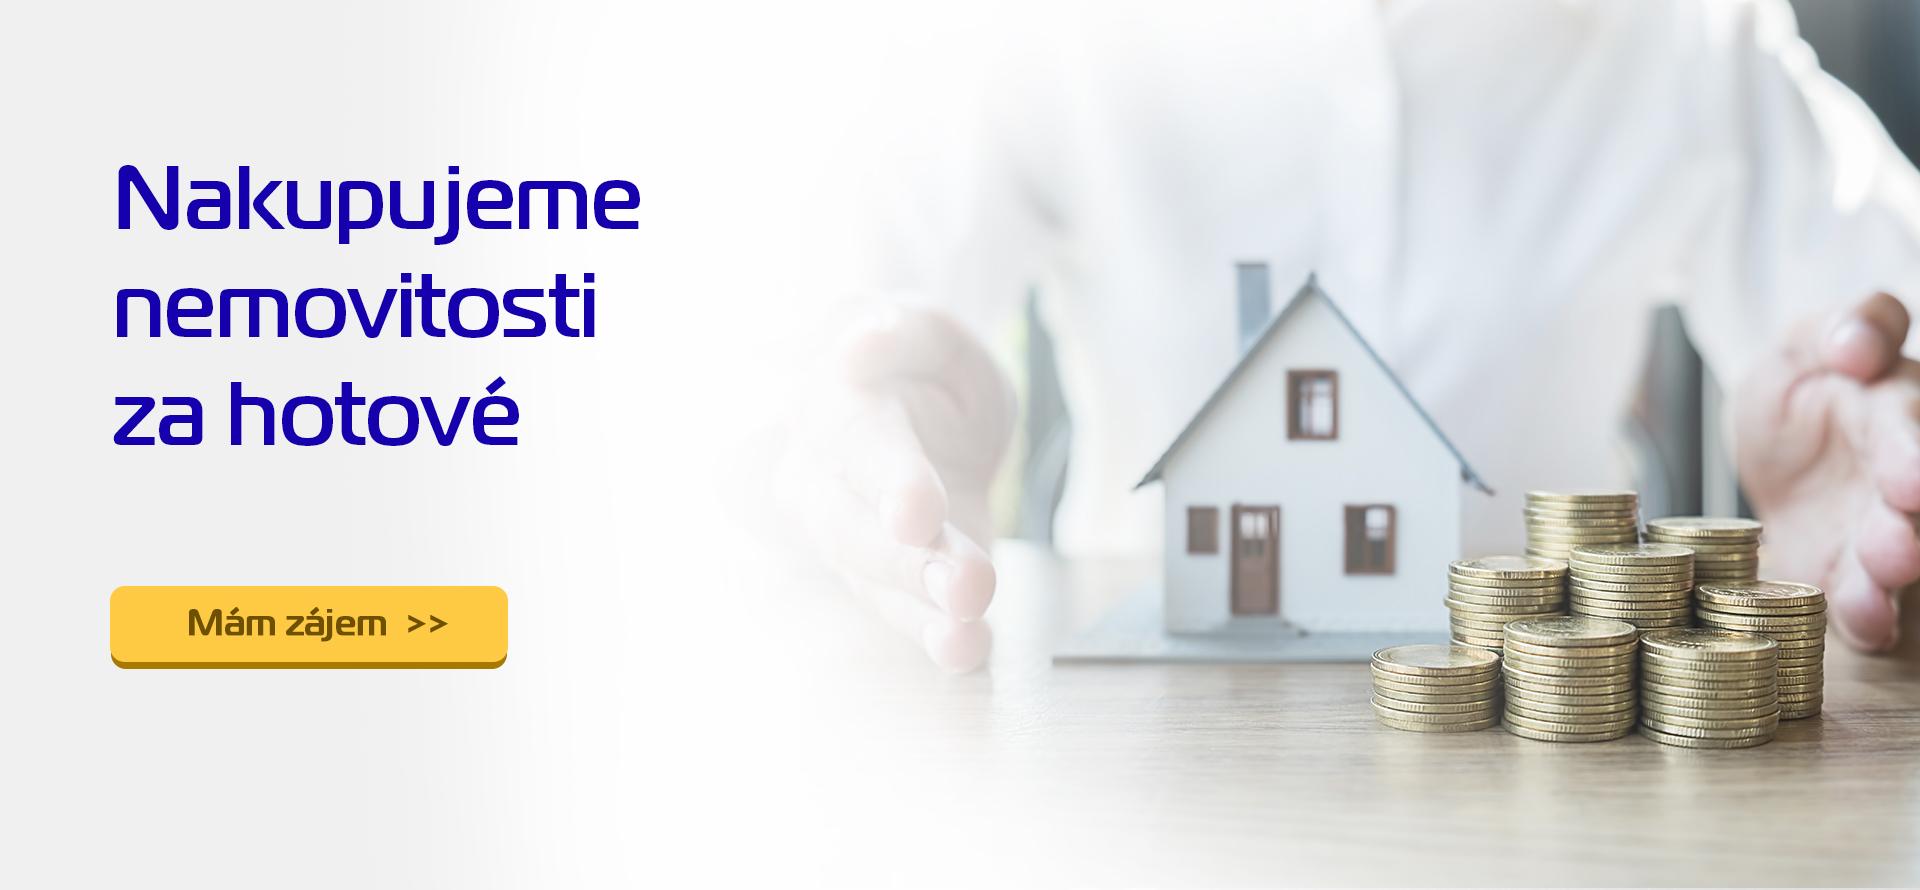 Nakupujeme nemovitosti za hotové